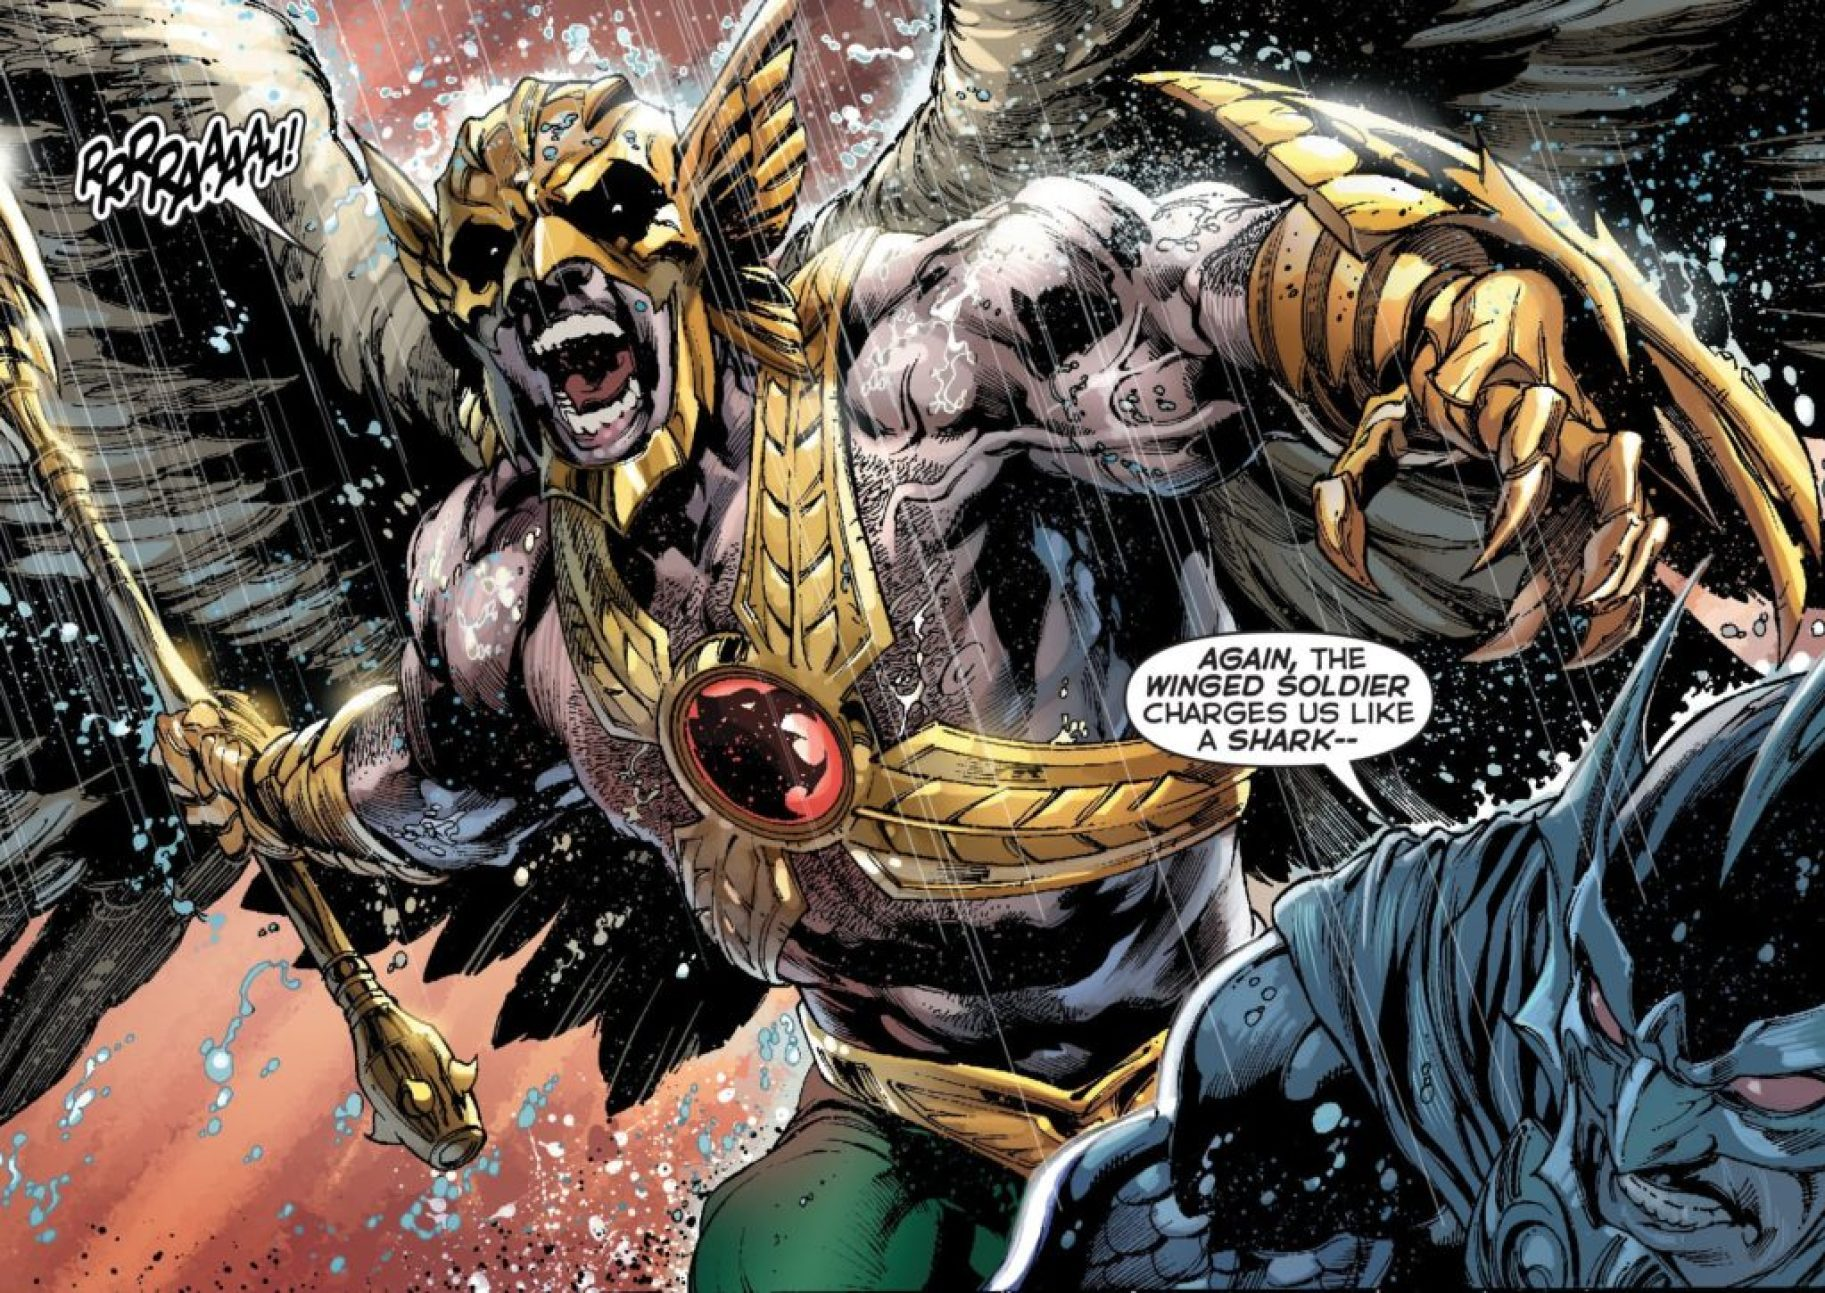 Savage Hawkman in DC's New 52